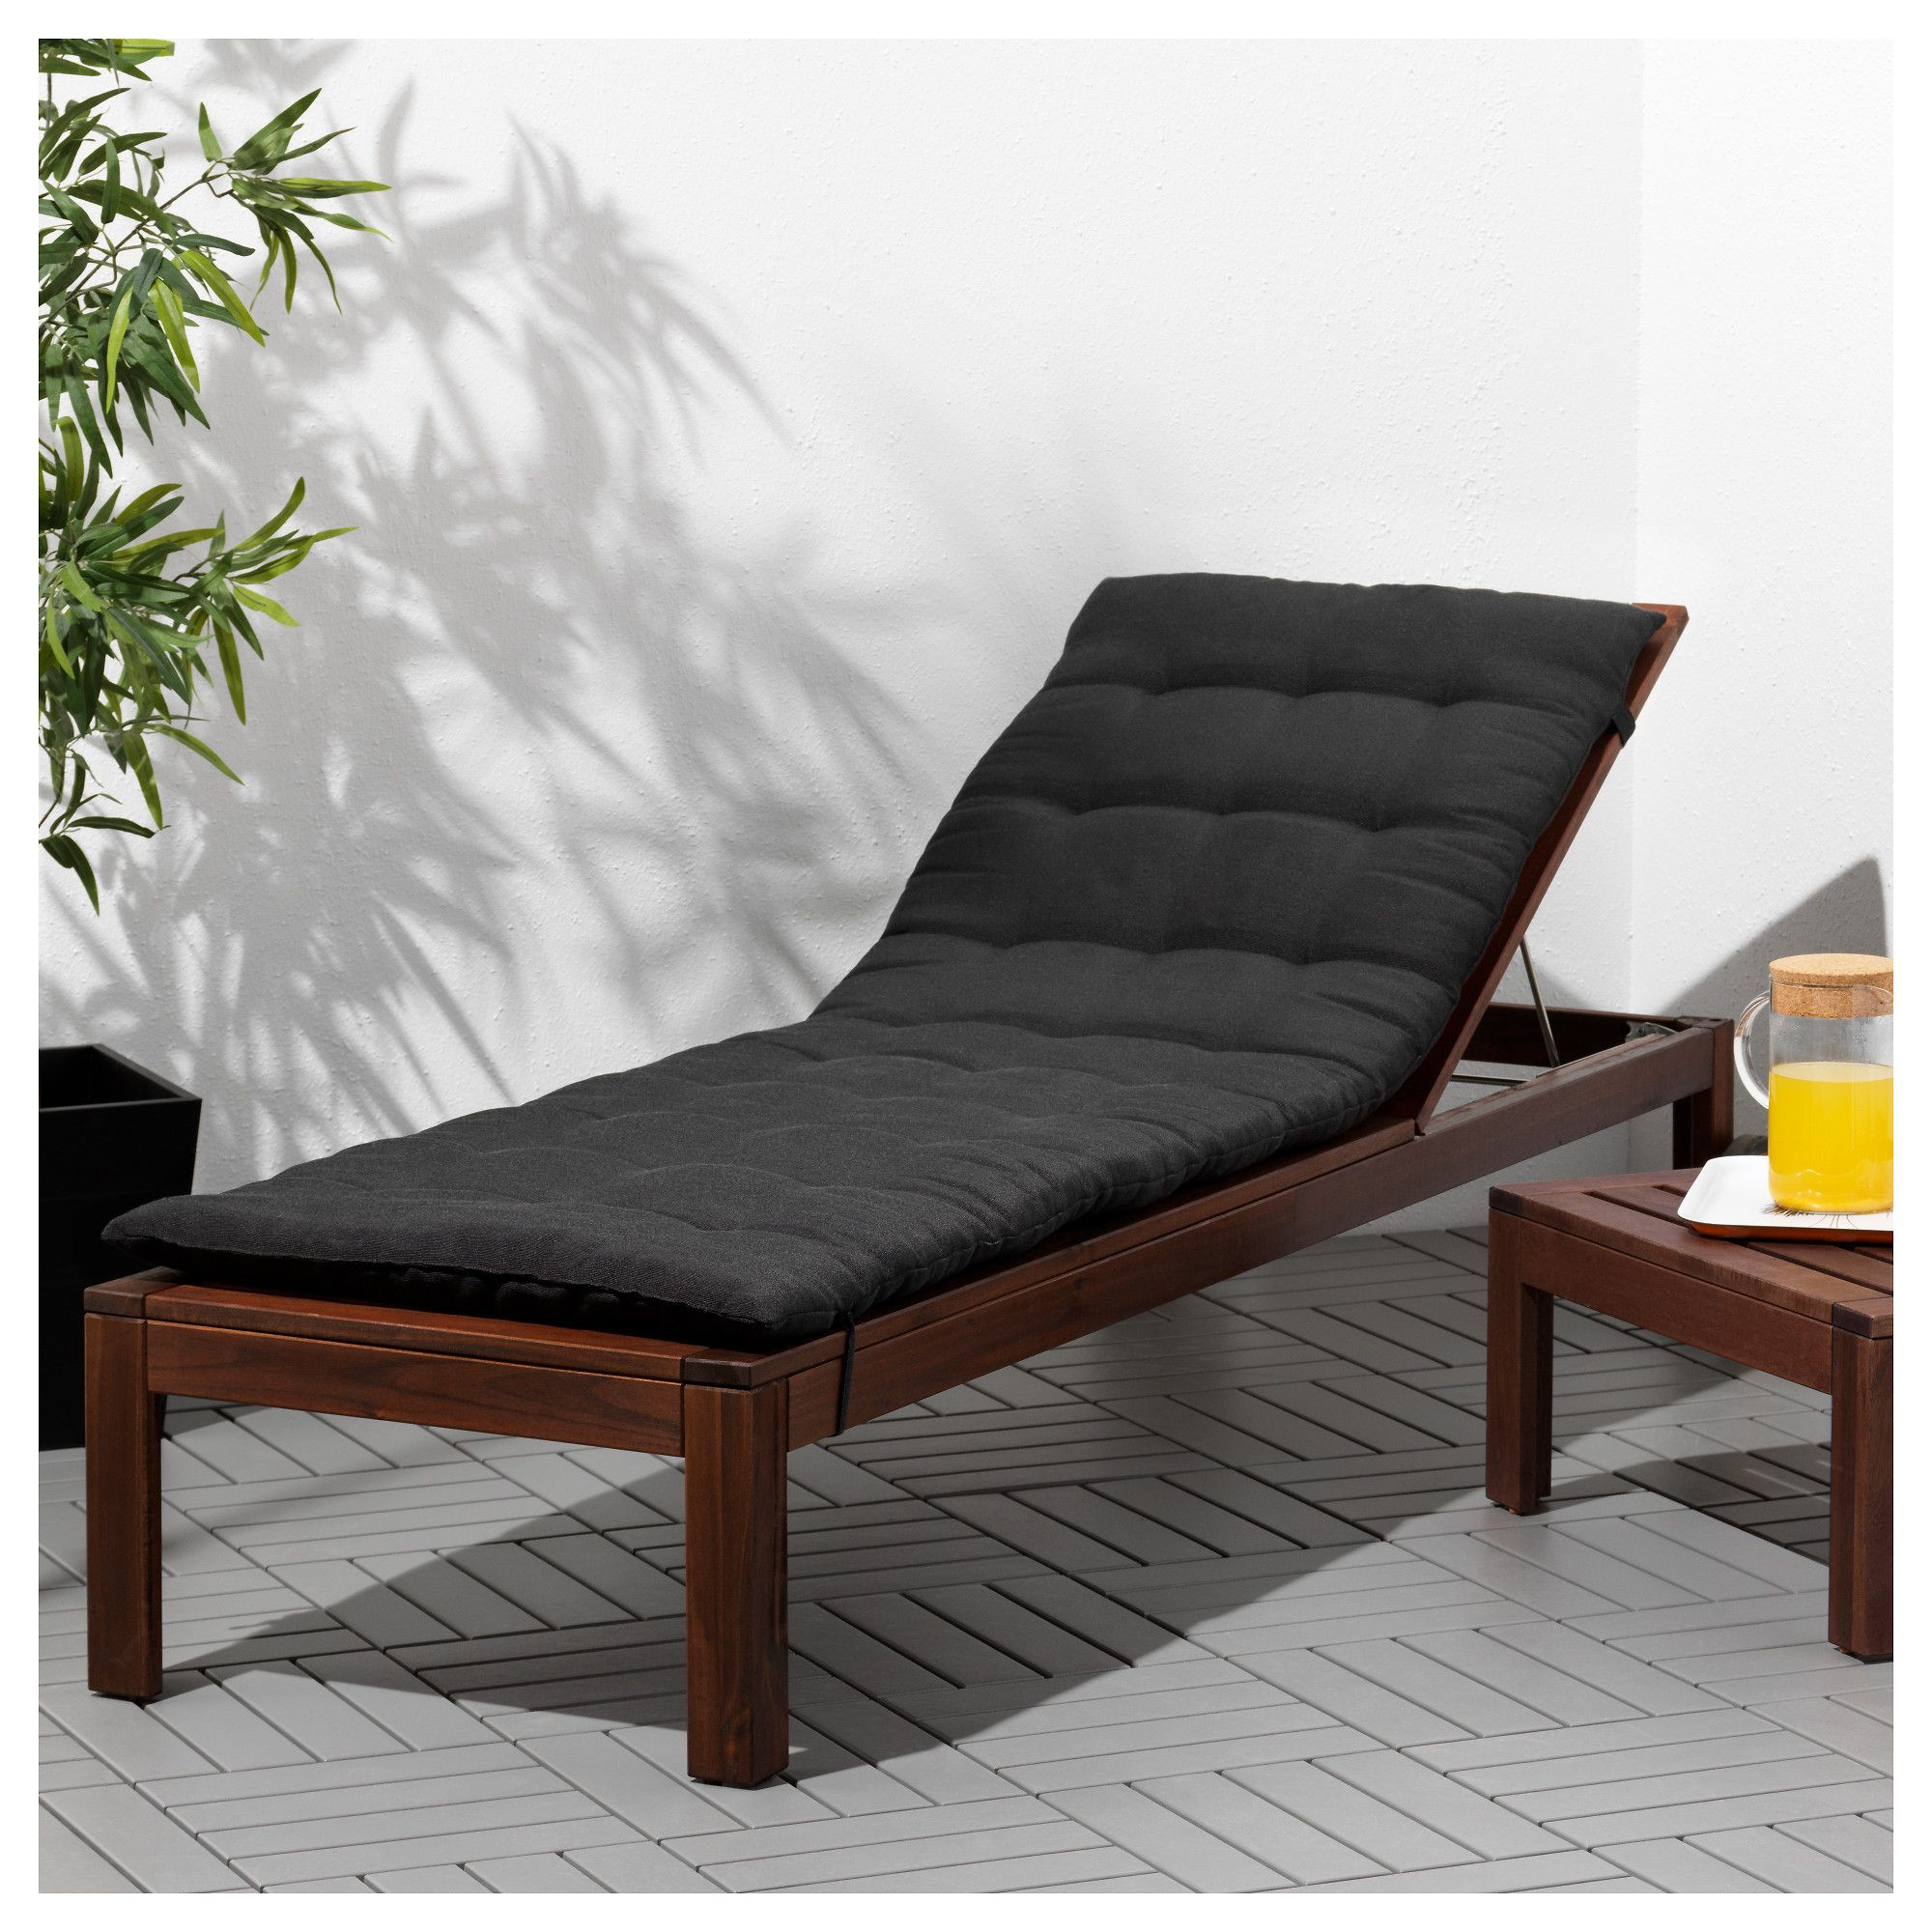 Ikea - Äpplarö Chaise Lounger Brown Stained | Sun Lounger ... destiné Transat Jardin Ikea